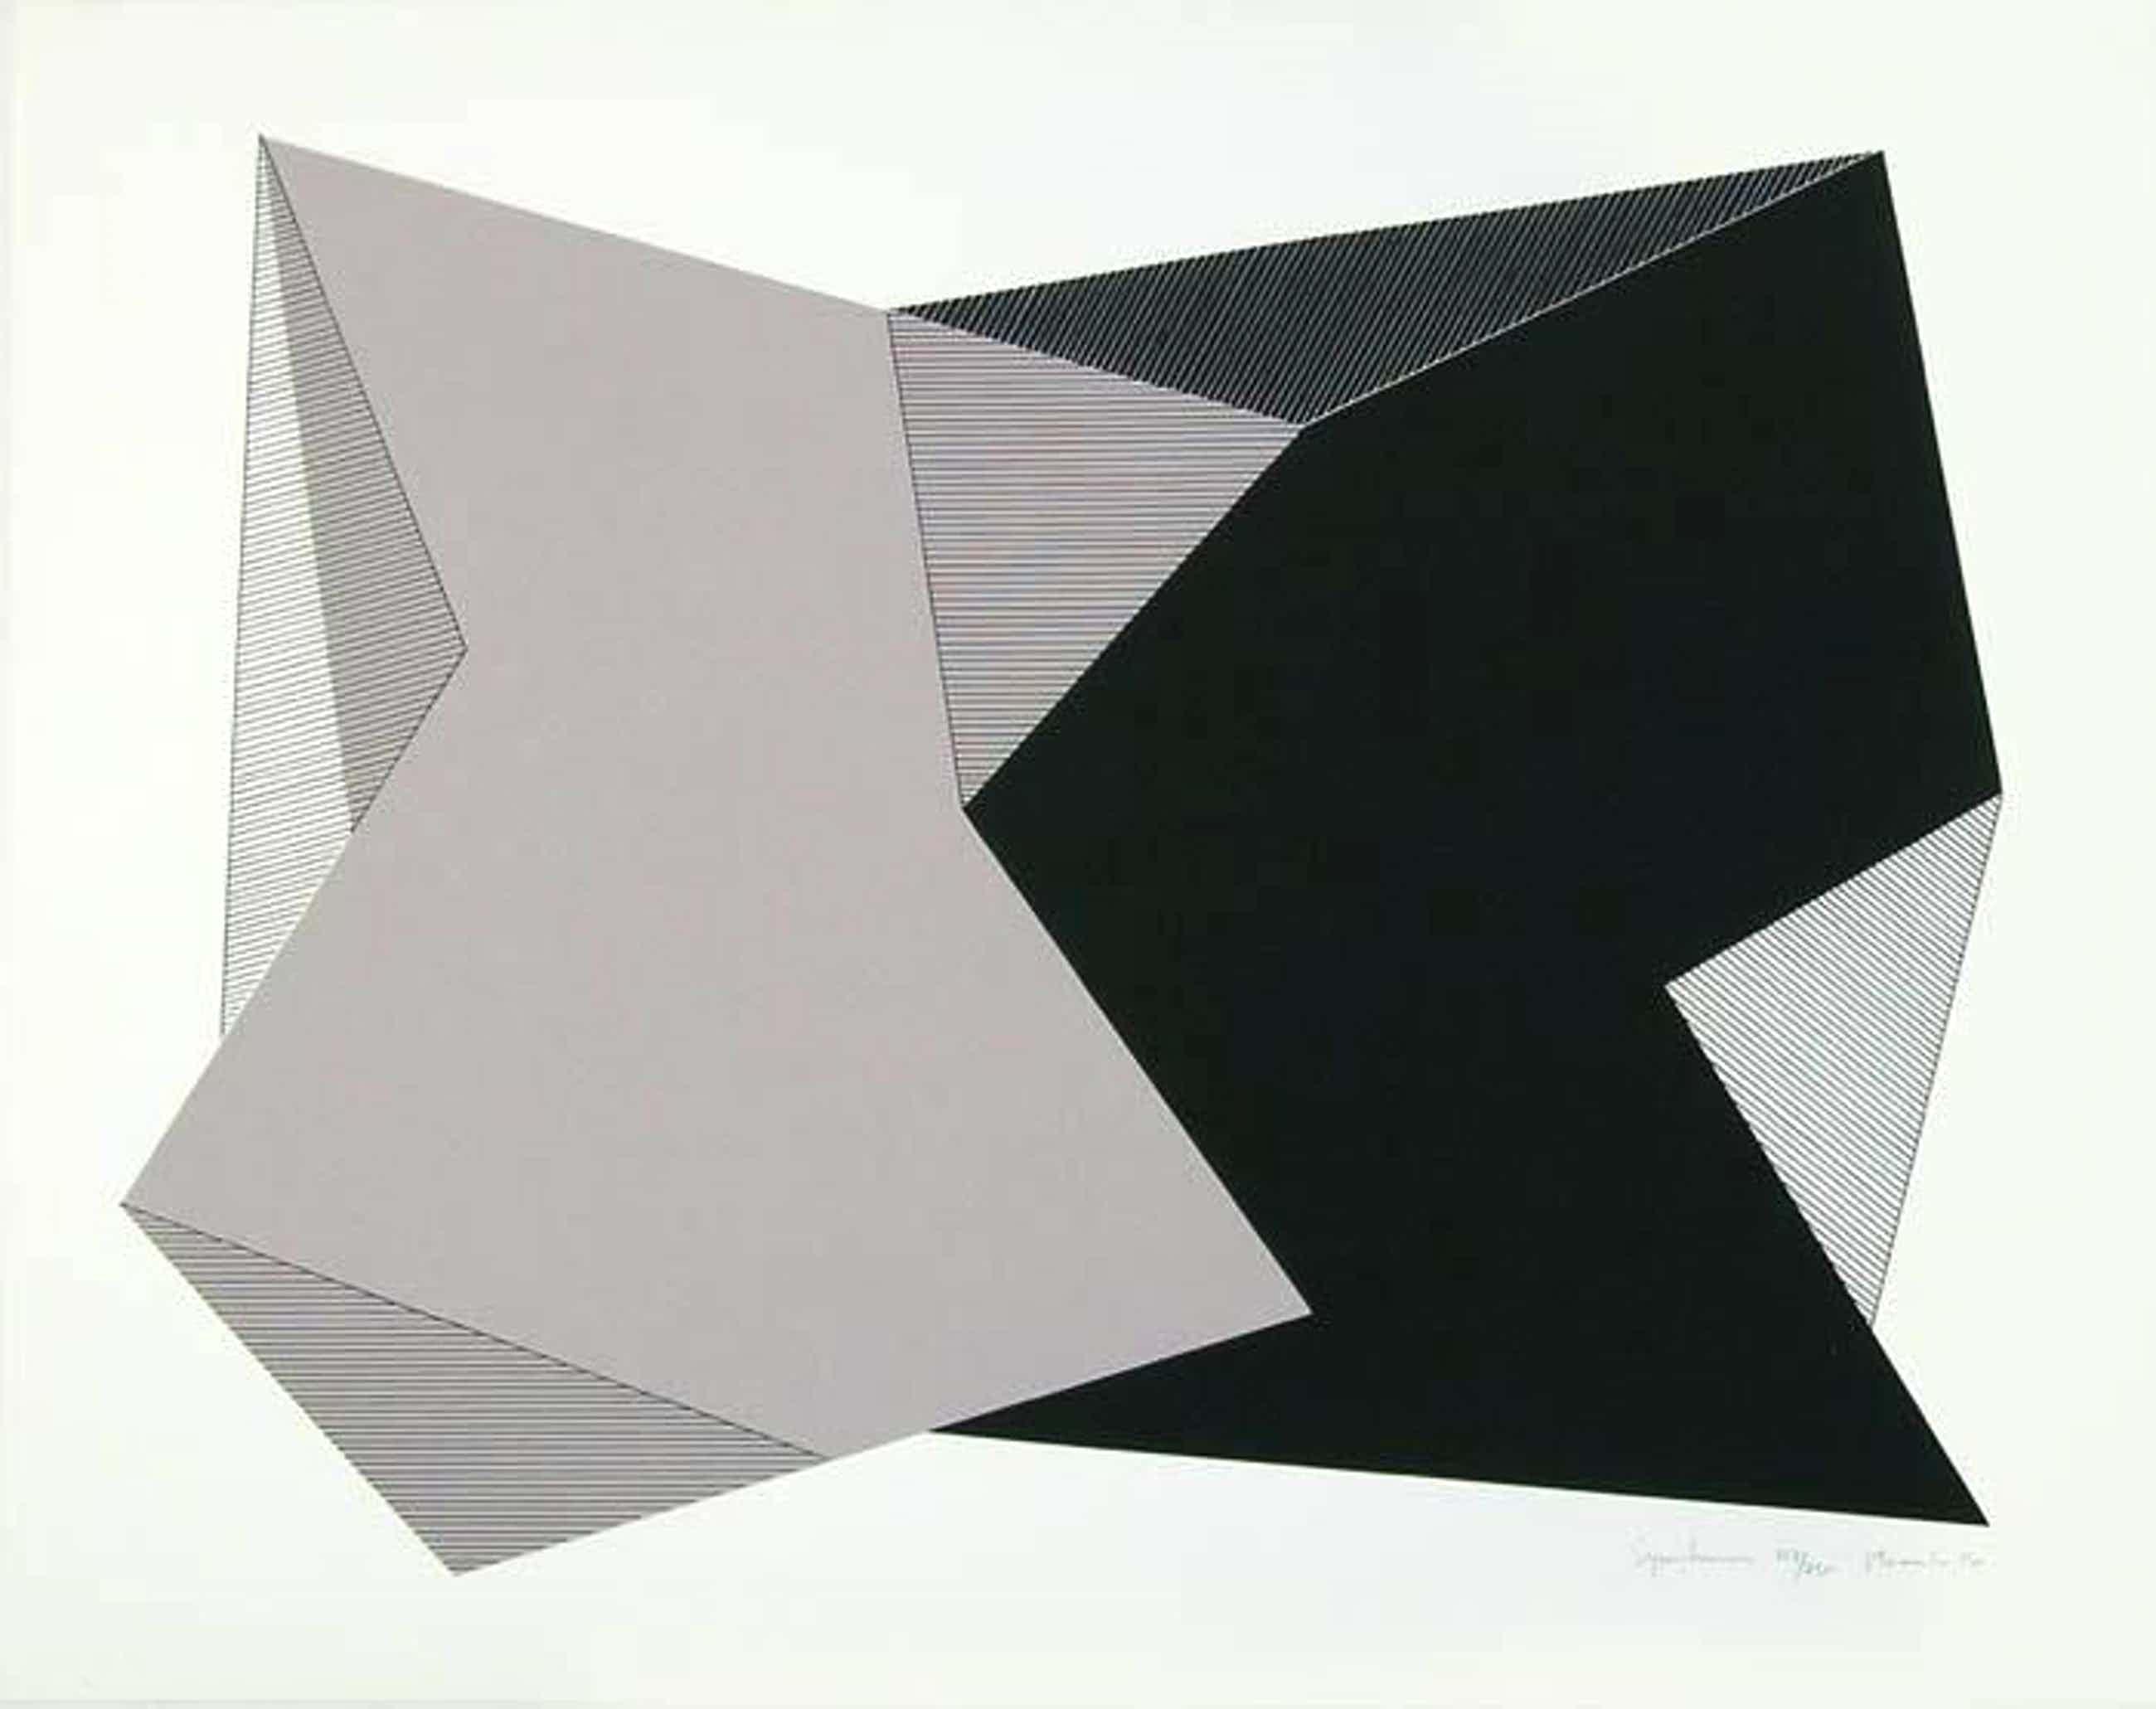 Jean Marie Haessle - Symetrics, Serigraphie, 1980, signiert, nummeriert kopen? Bied vanaf 60!